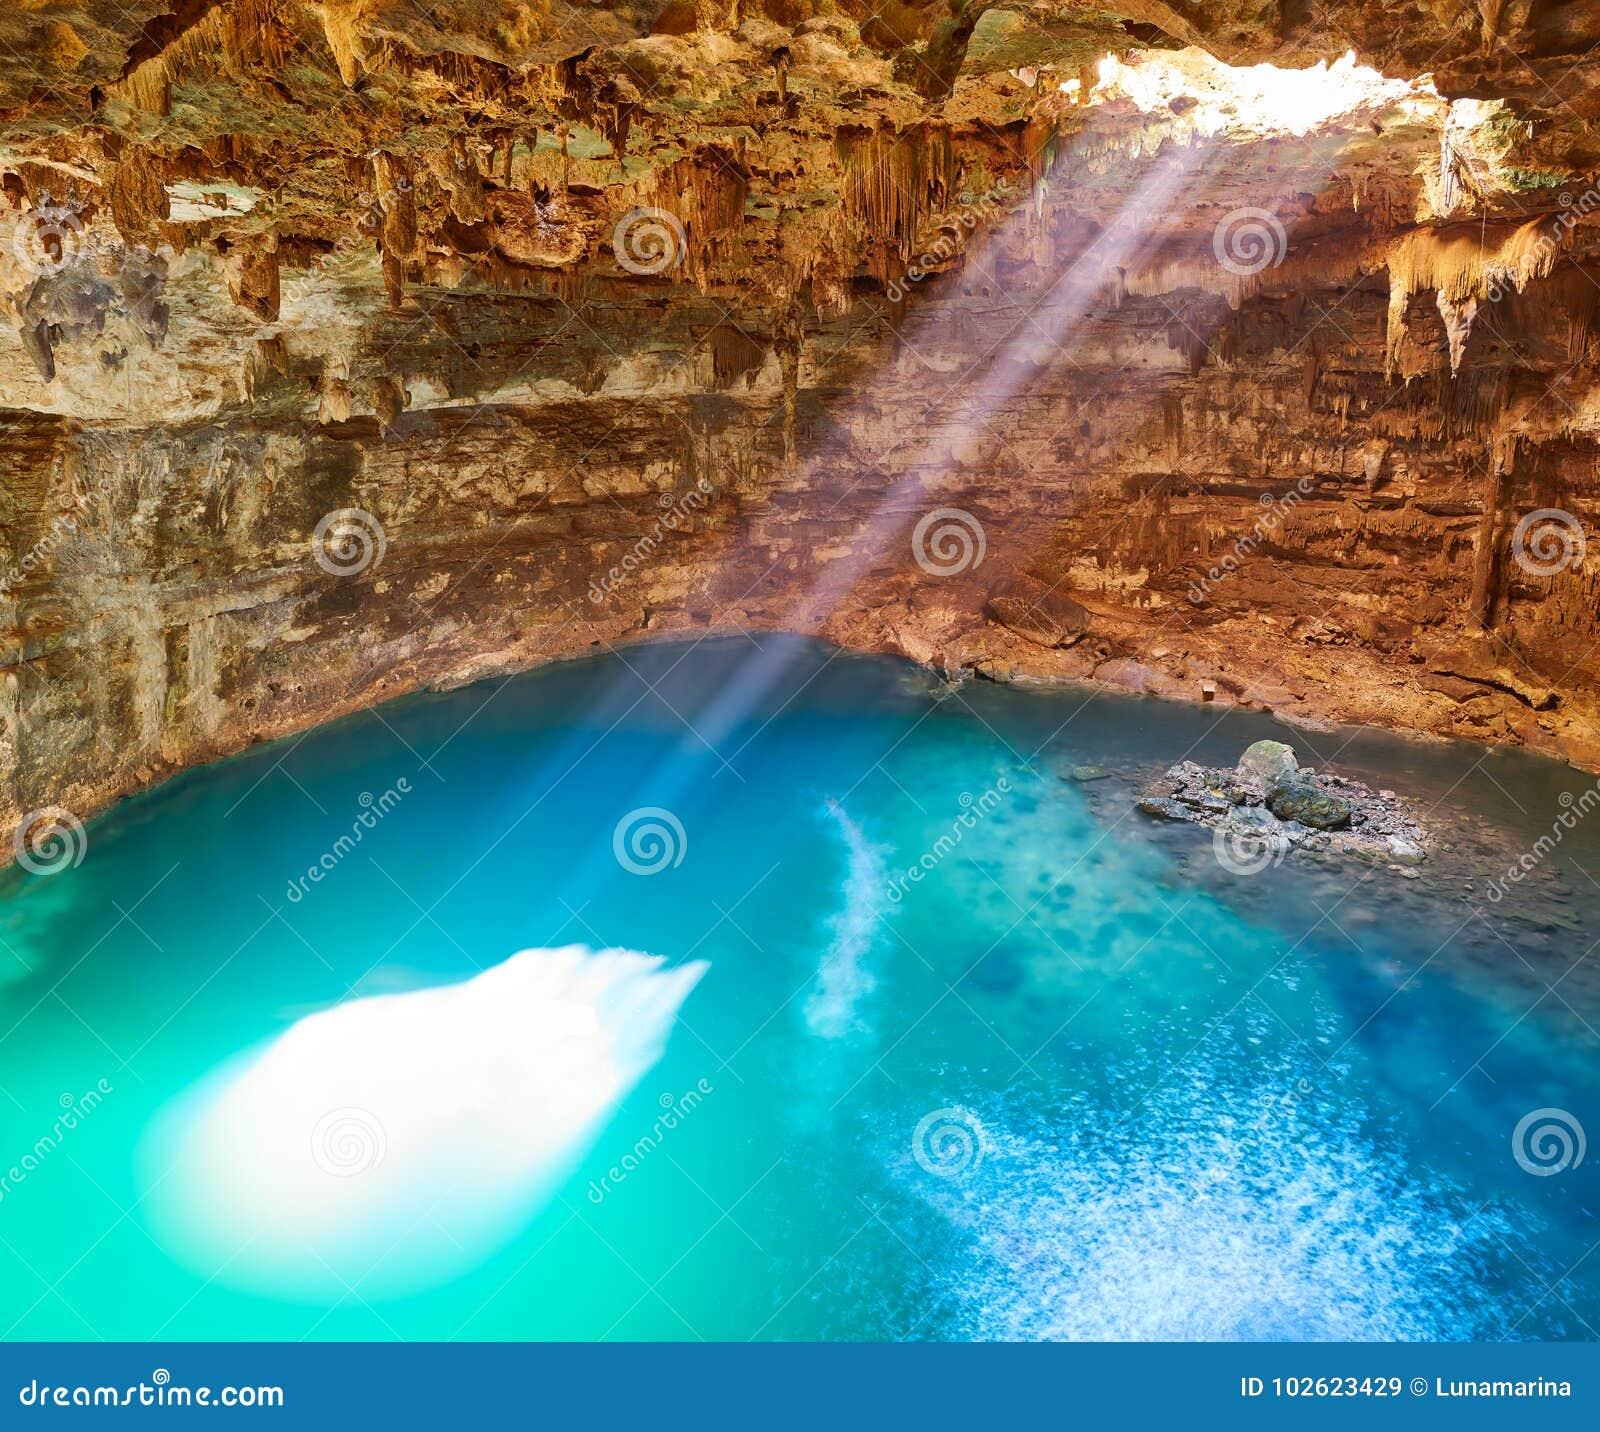 Cenote Samula Sinkhole In Valladolid Mexico Stock Image